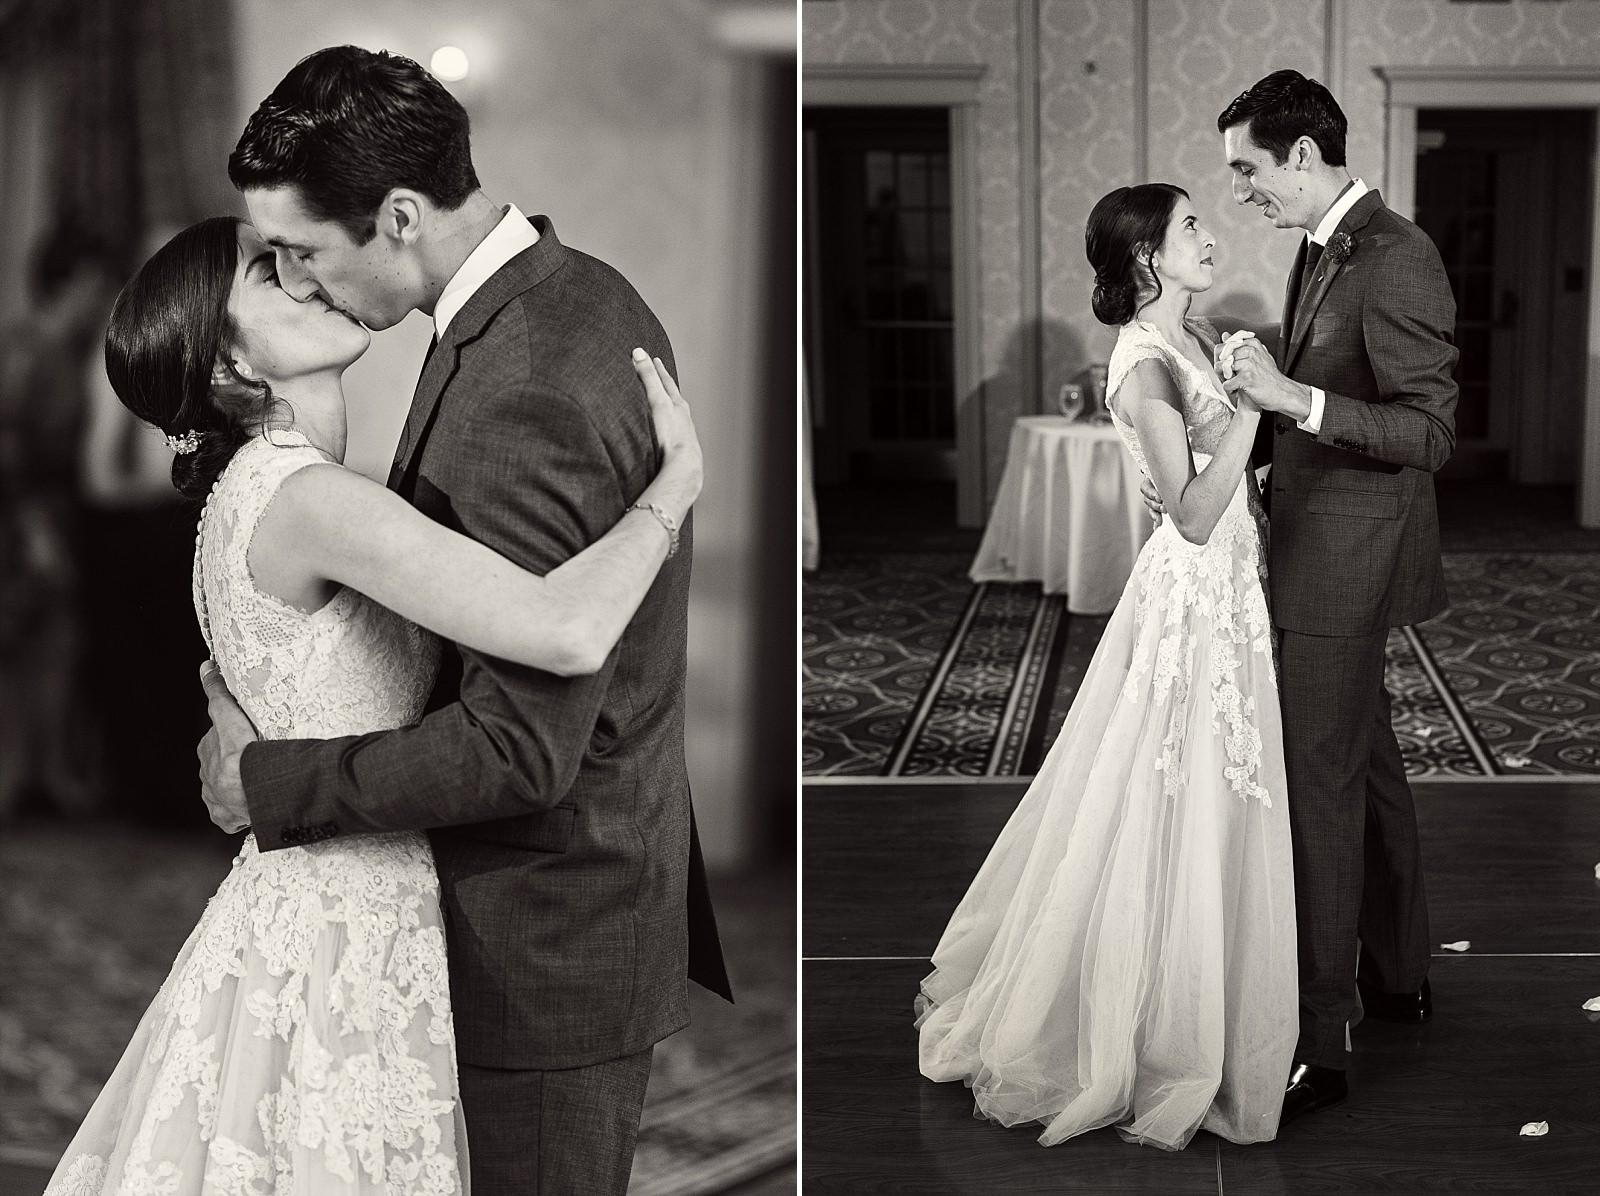 MA_Wedding_Photographer_TaJa_Gallery_10.jpg